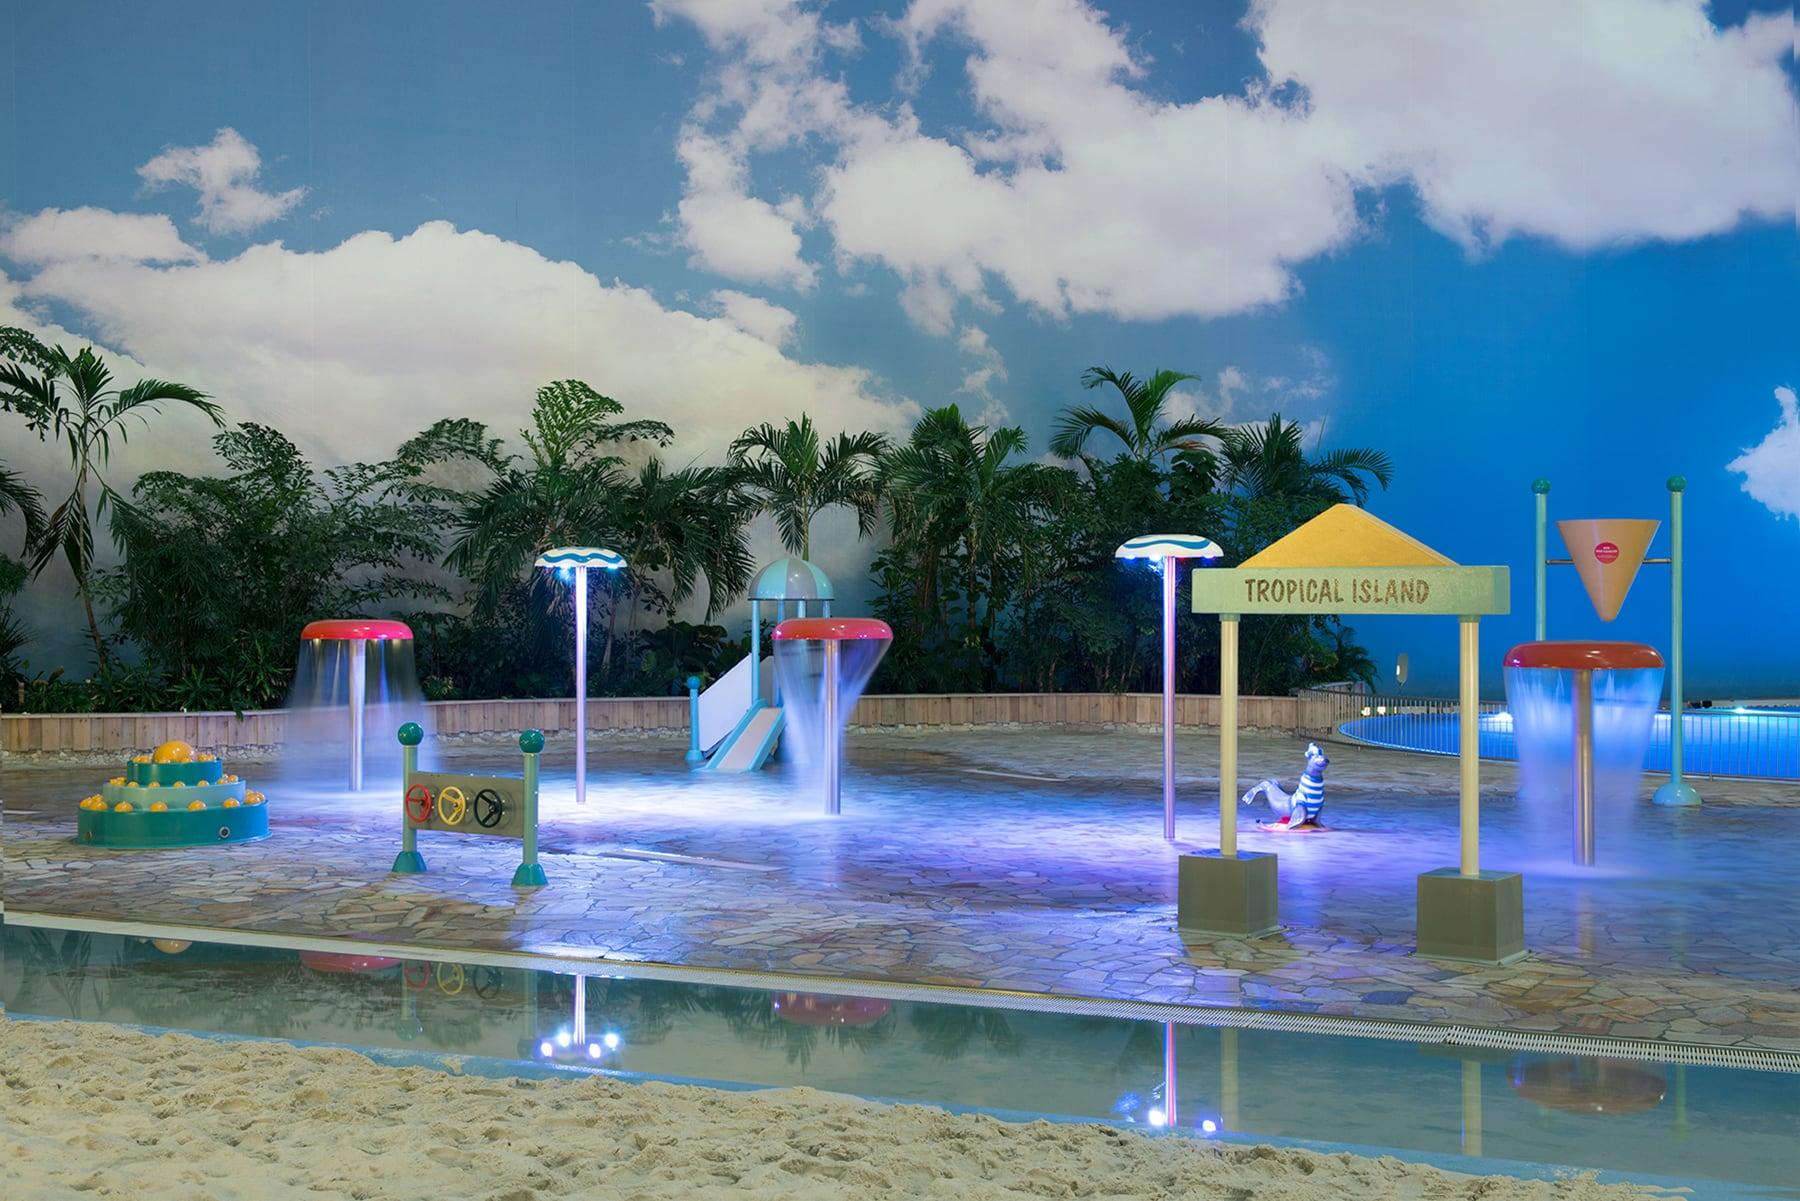 Tropical Sea #1, 2013